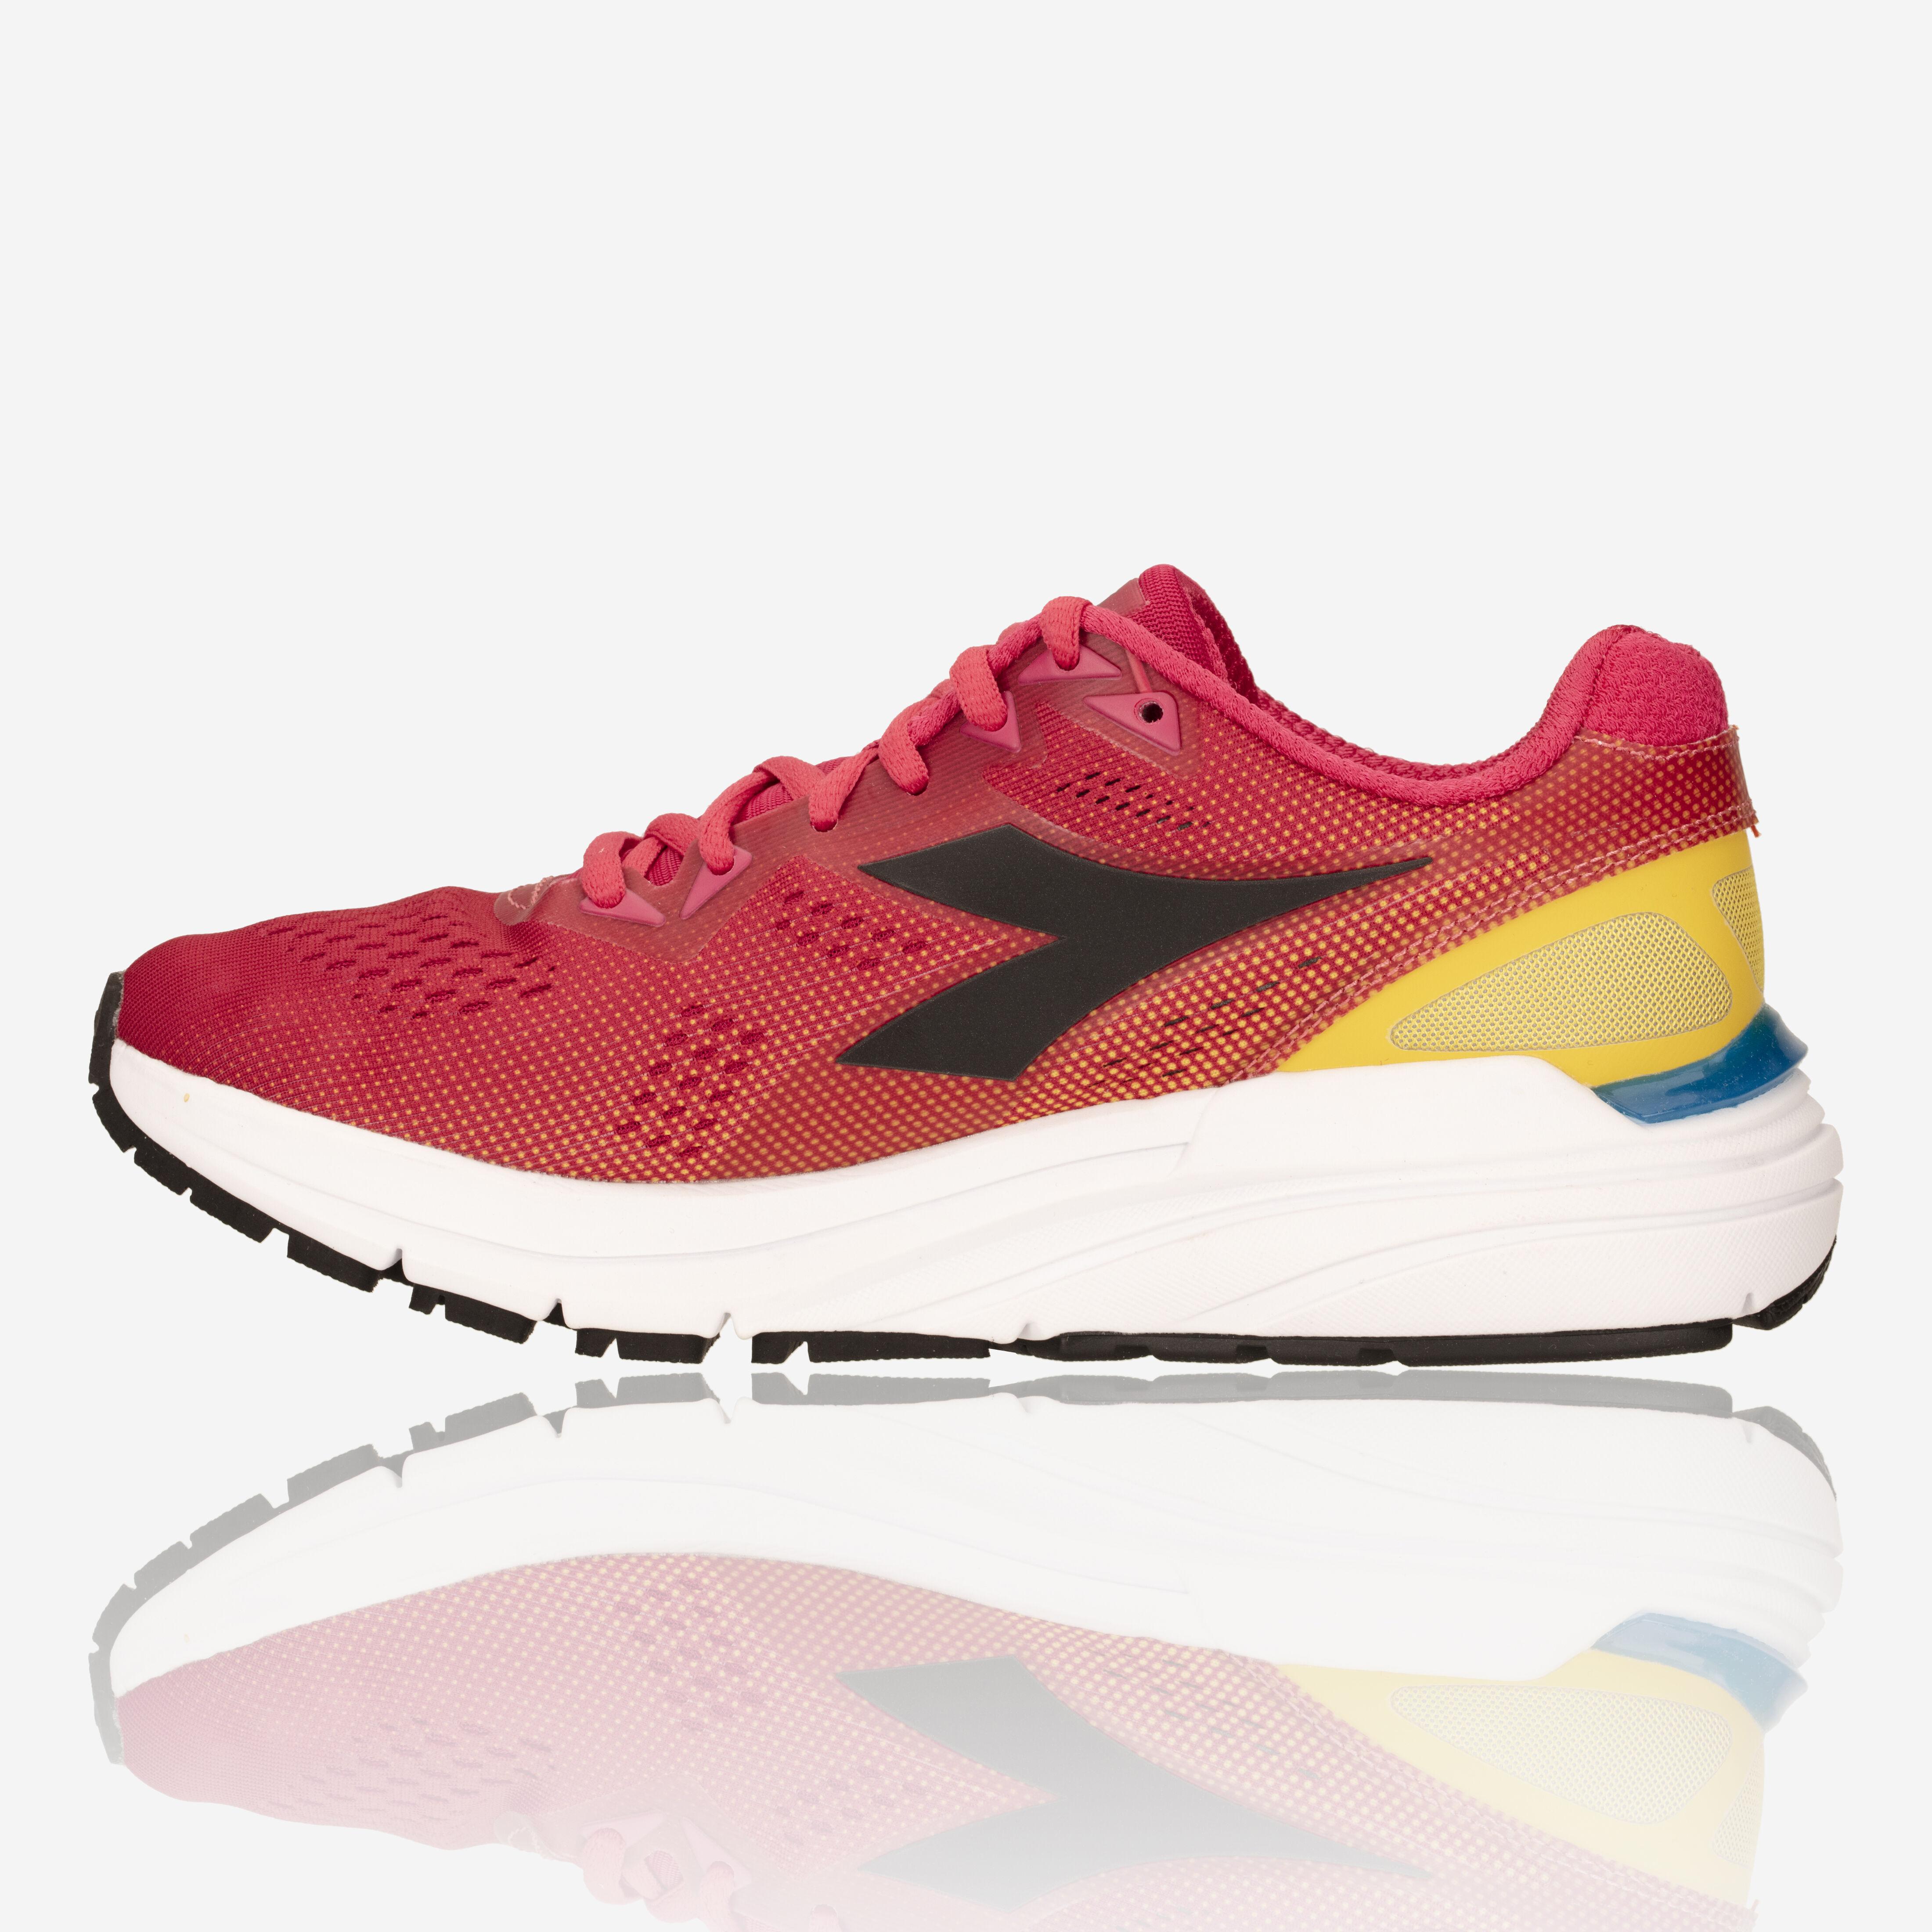 Diadora Mythos Blushield 3 Womens Running Shoes